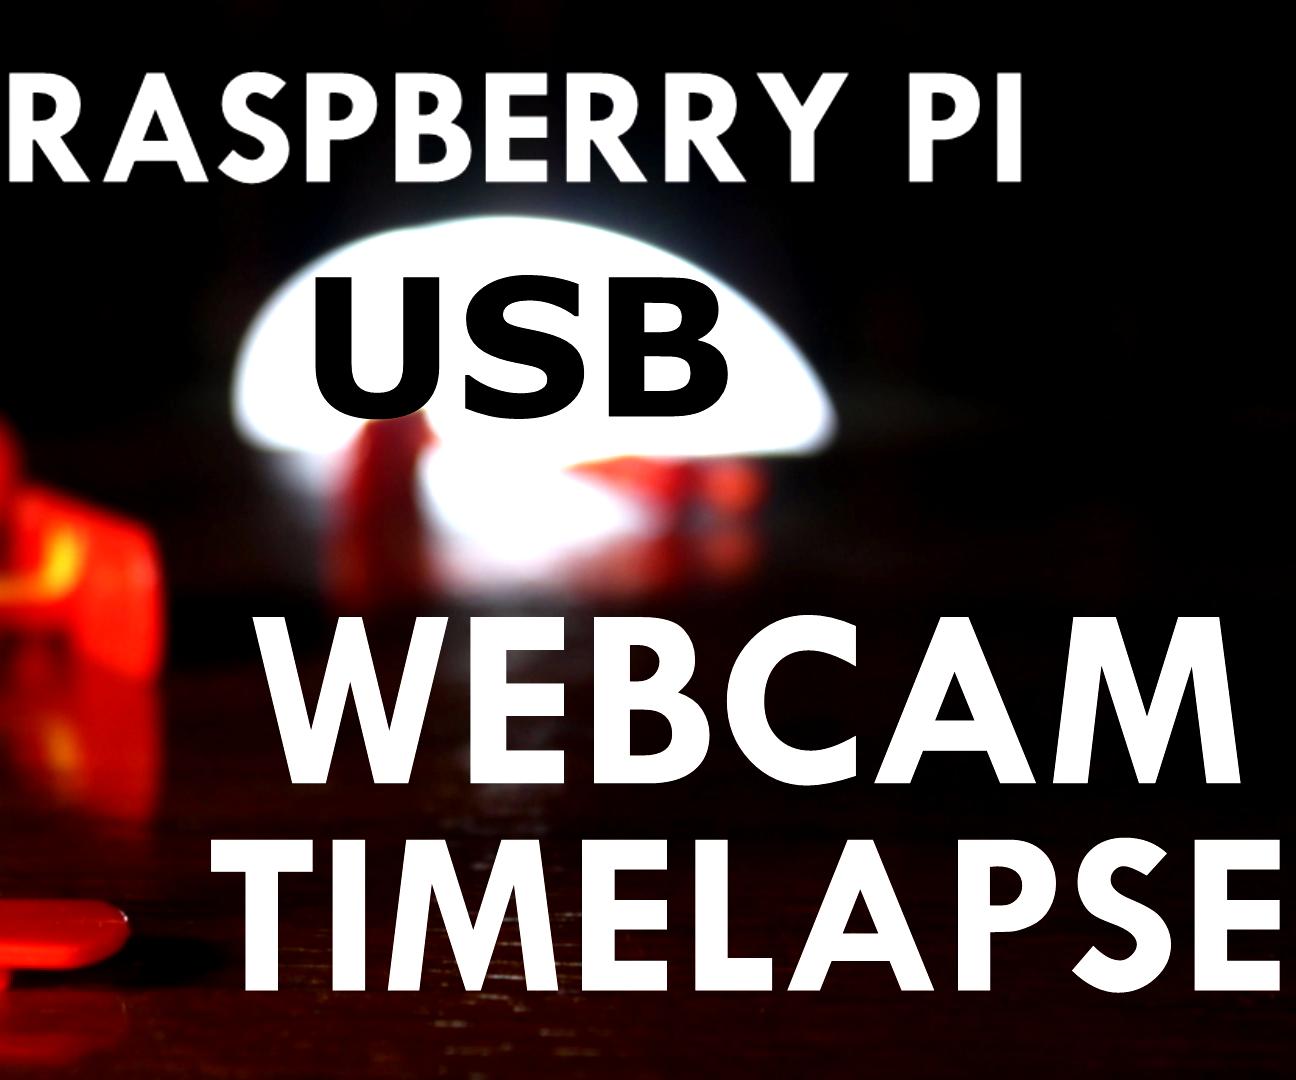 How to Produce a Timelapse by USB Webcam & Raspberry Pi